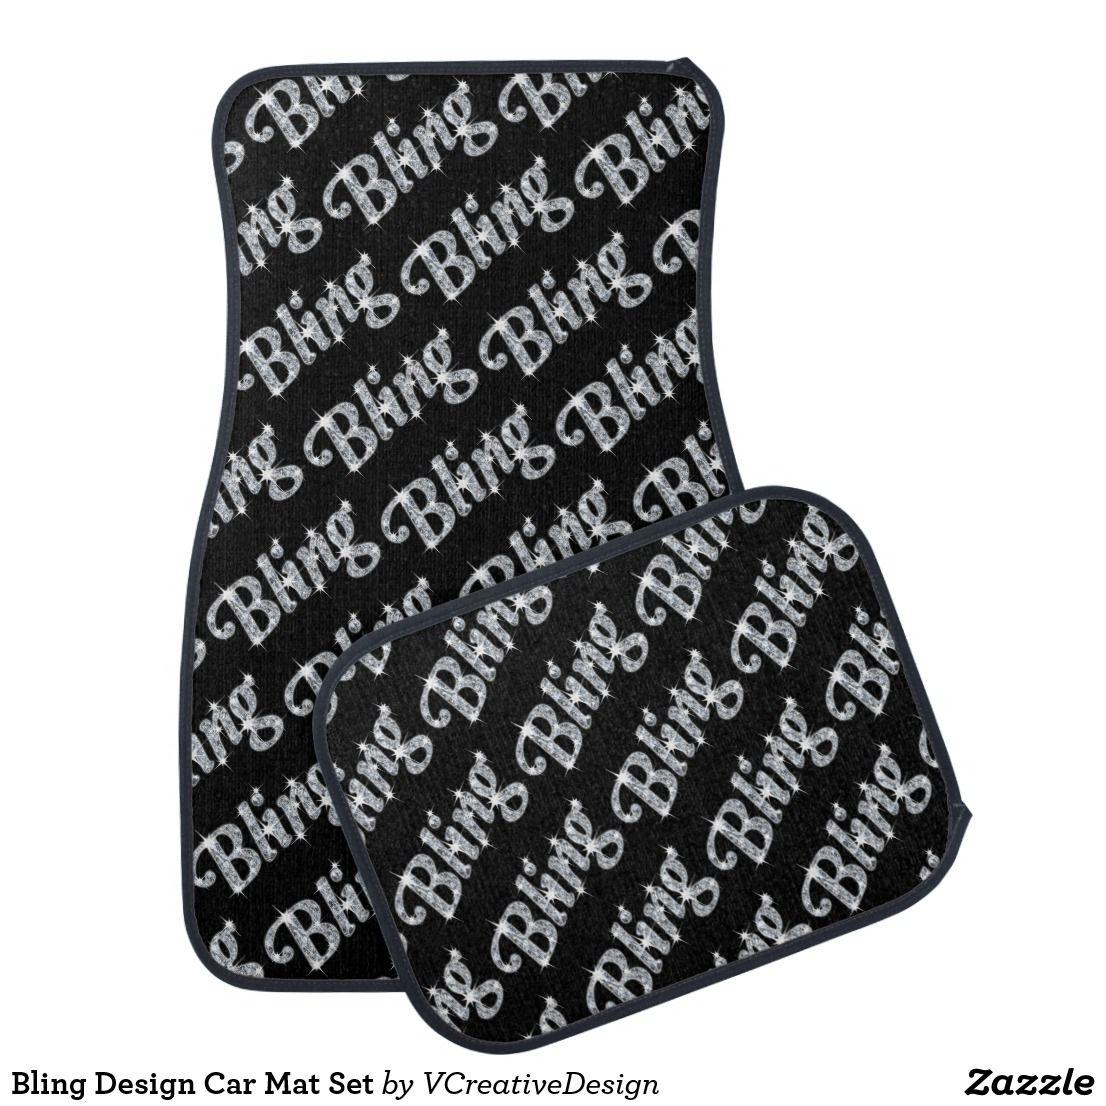 Bling Design Car Mat Set Zazzle.co.uk Bling design